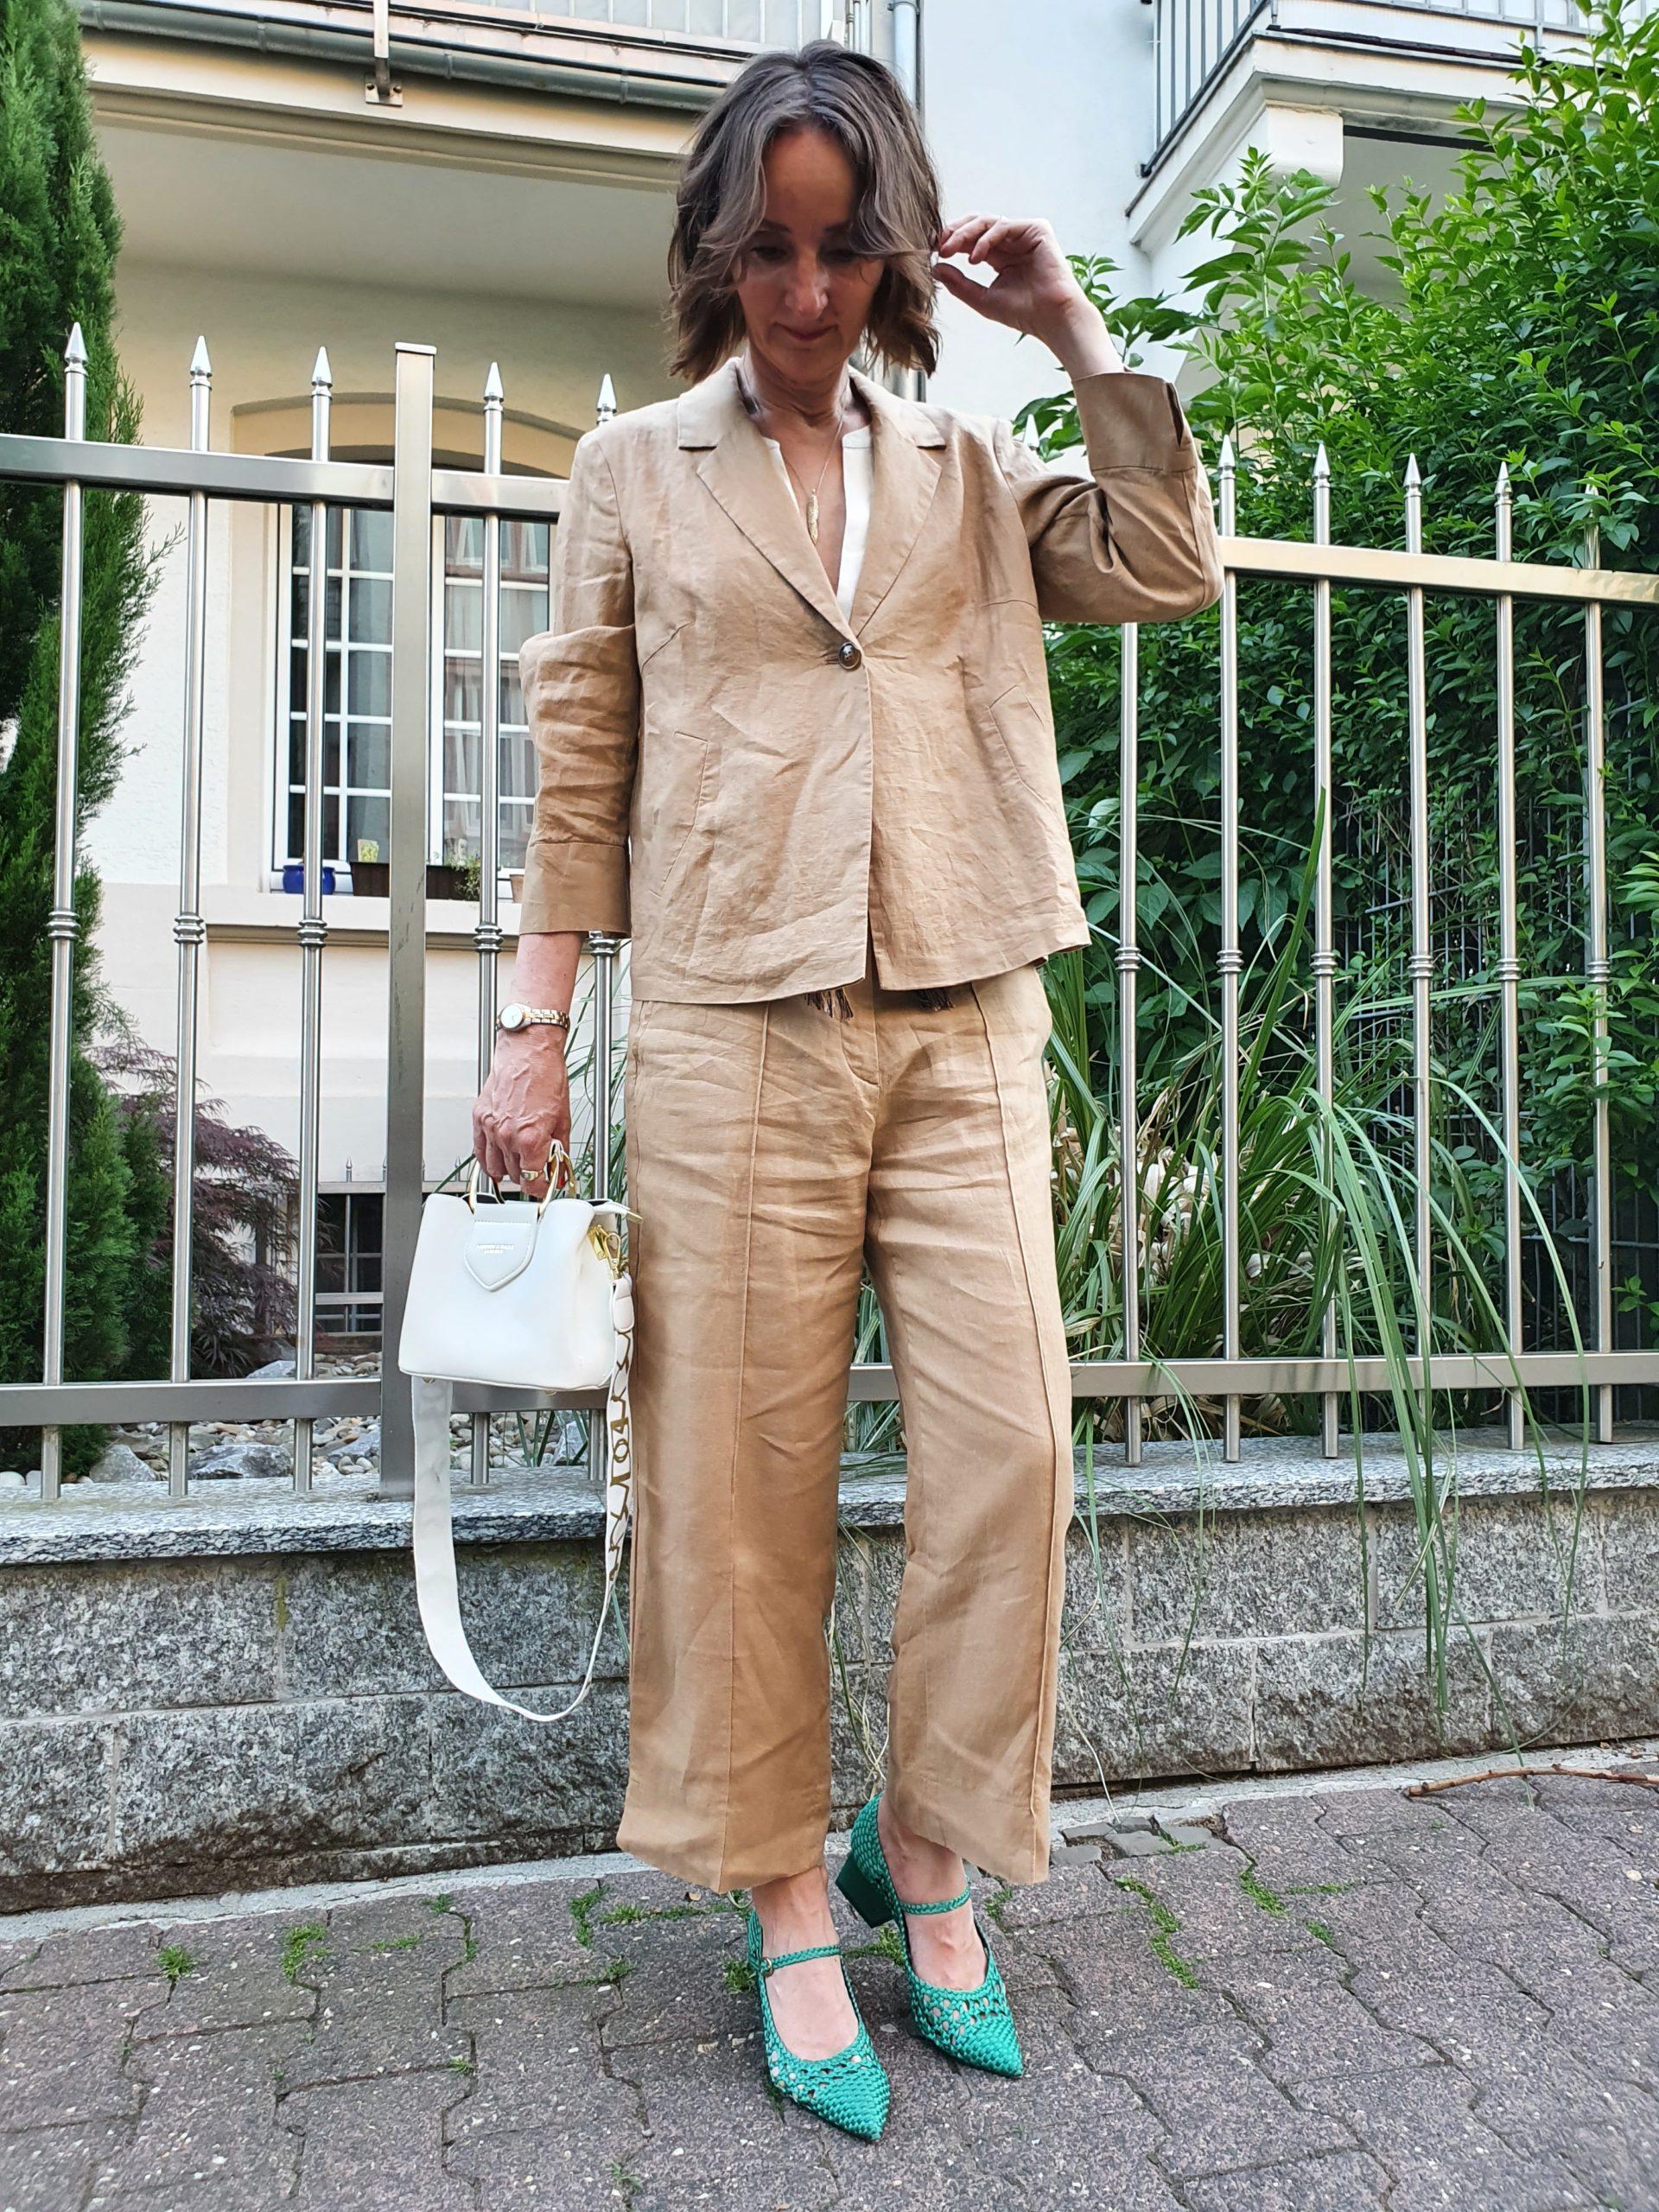 nachhaltige-mode-leinenanzug-dameng-beige-erry-weber.jpg